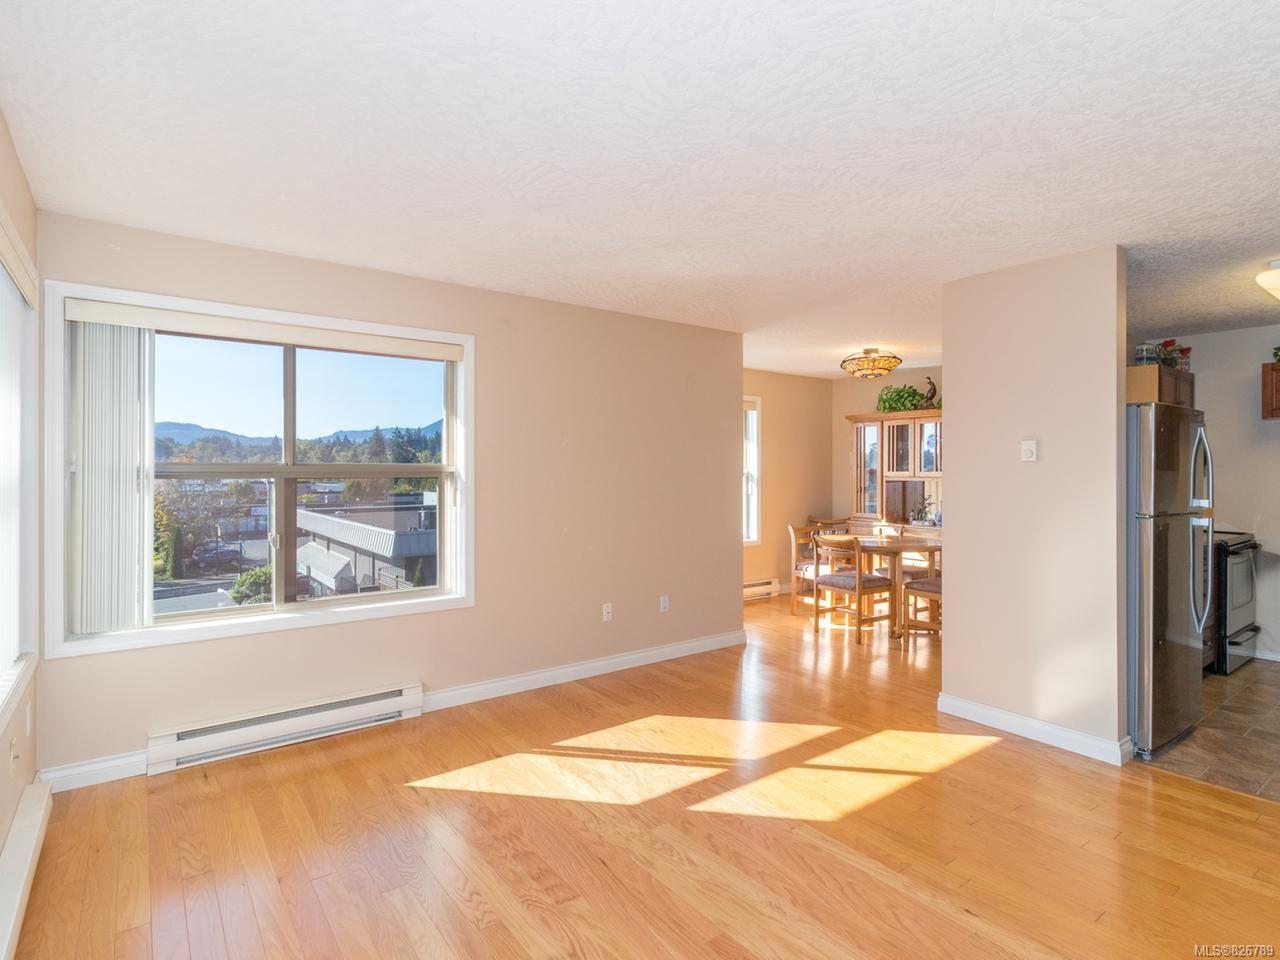 Photo 5: Photos: 304 330 Brae Rd in DUNCAN: Du West Duncan Condo for sale (Duncan)  : MLS®# 826789